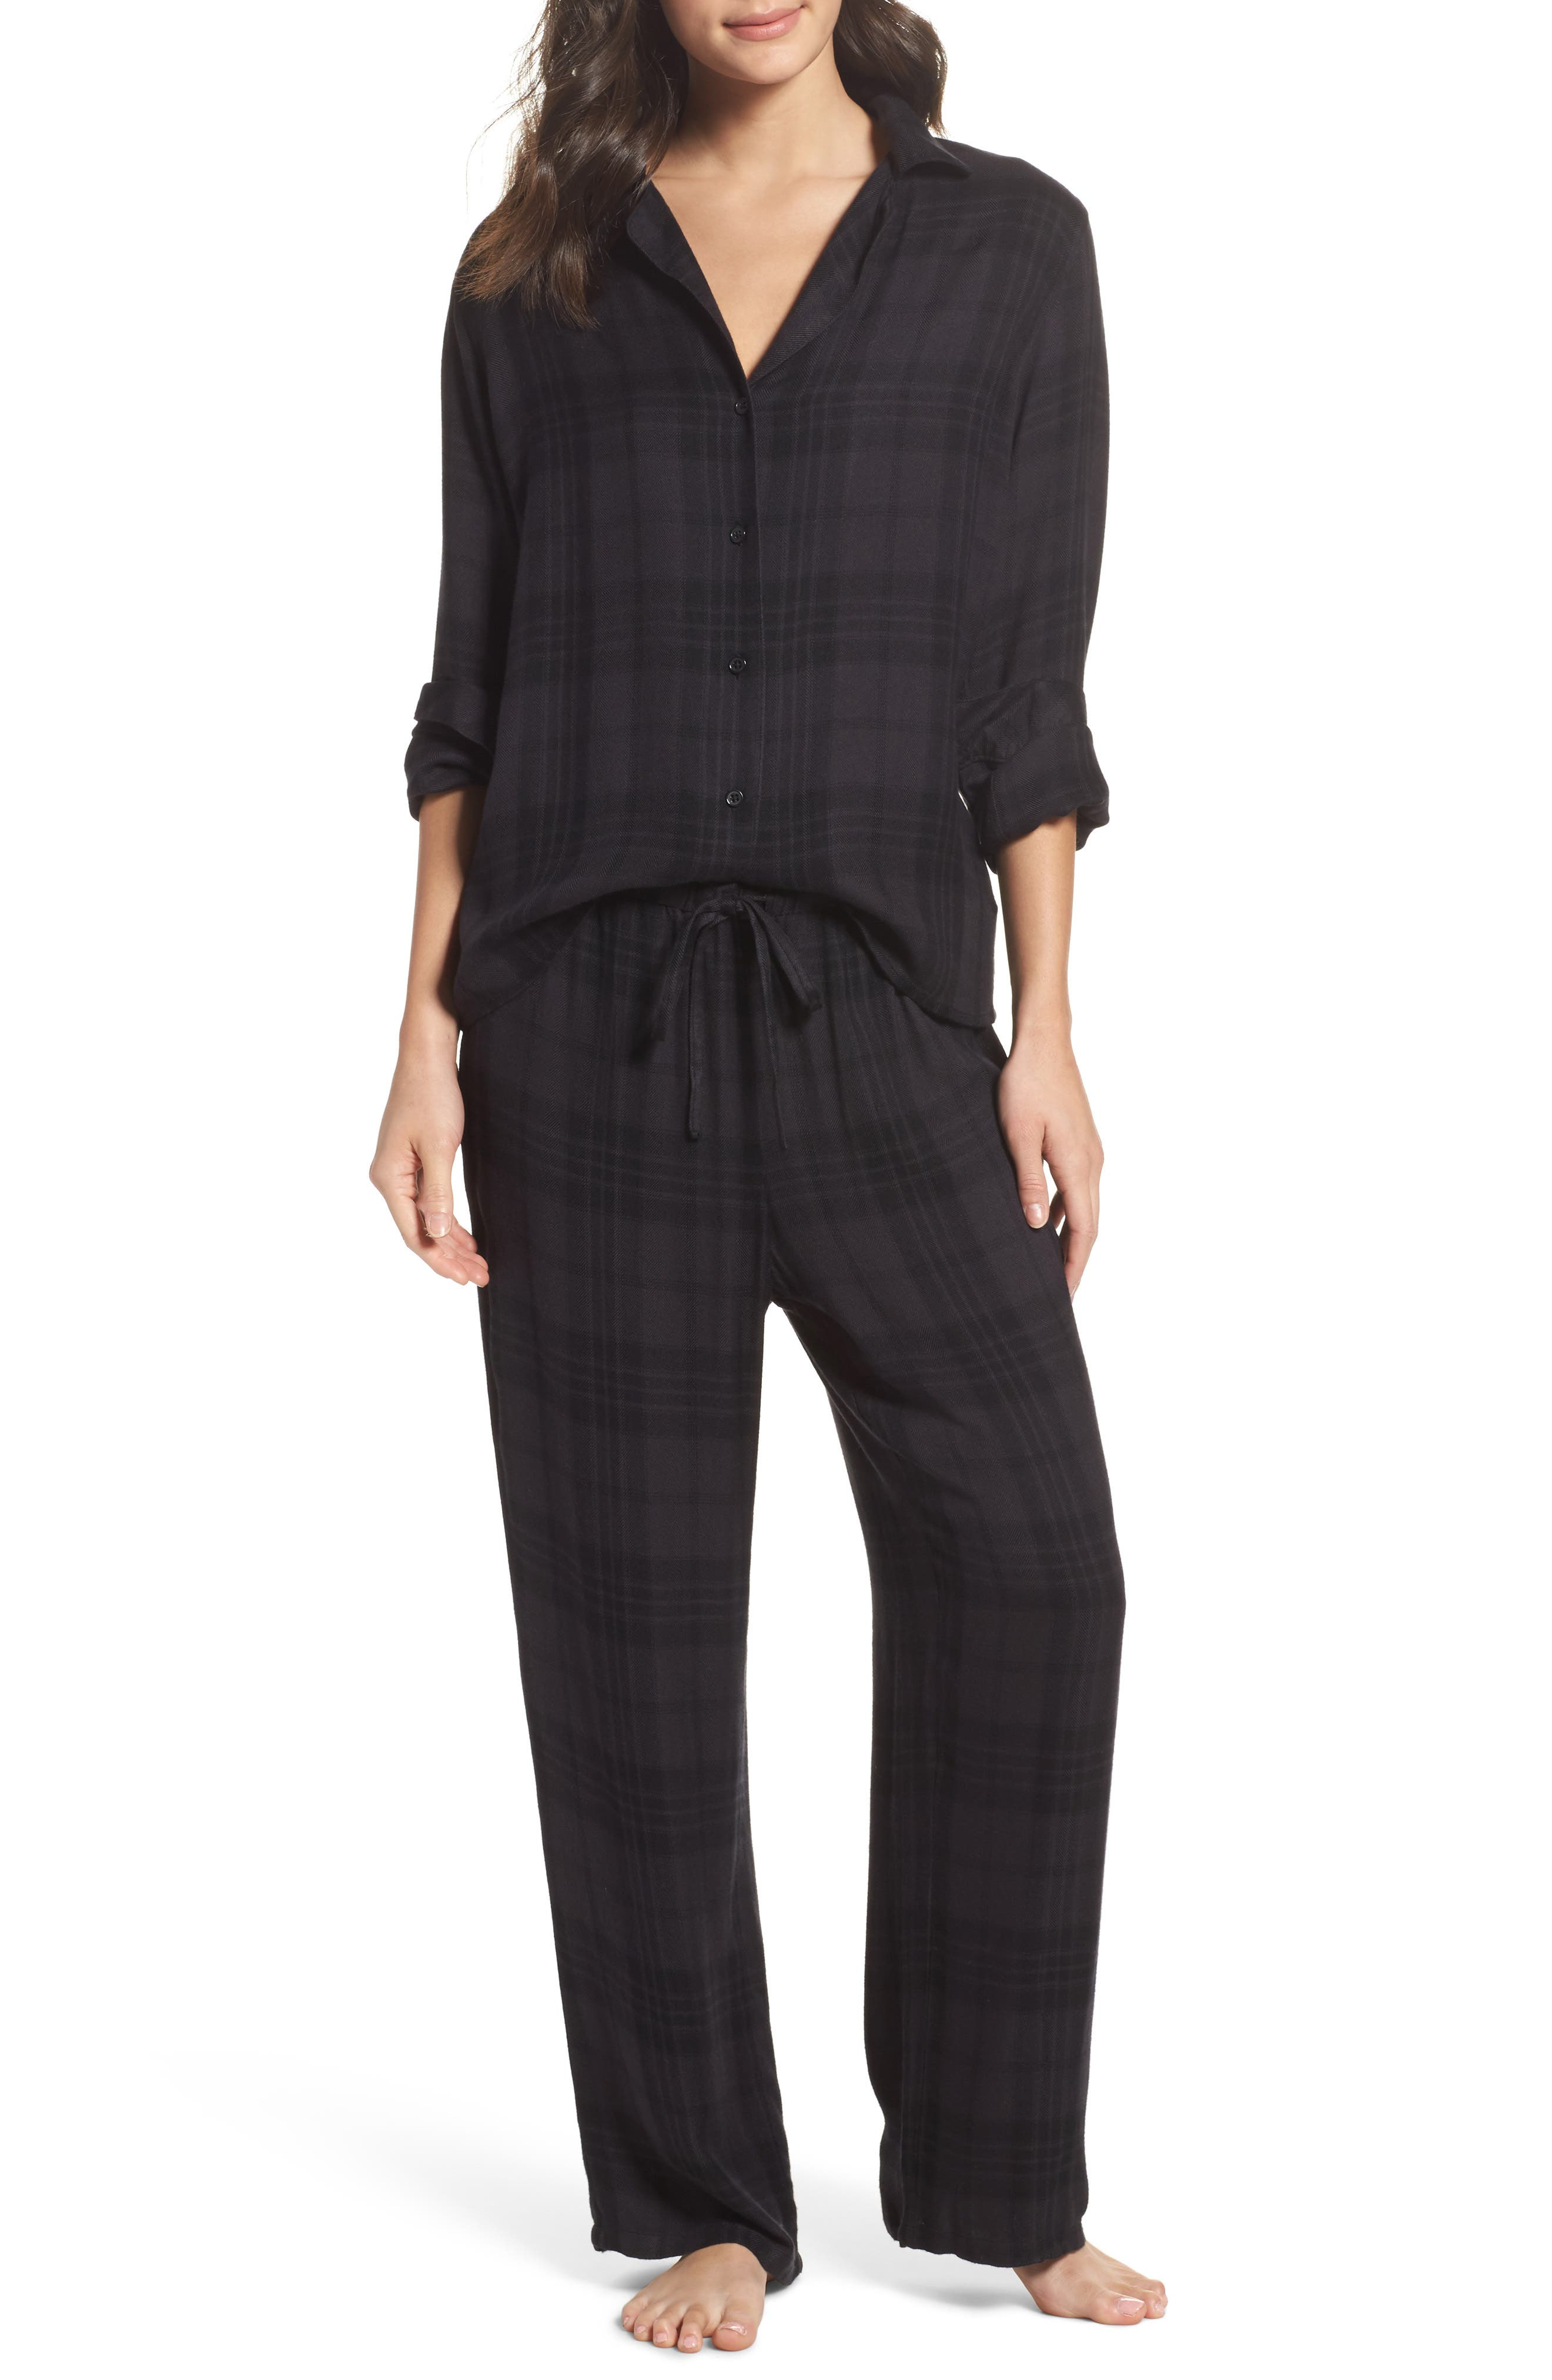 Plaid Pajamas,                             Main thumbnail 1, color,                             Onyx/ Jet